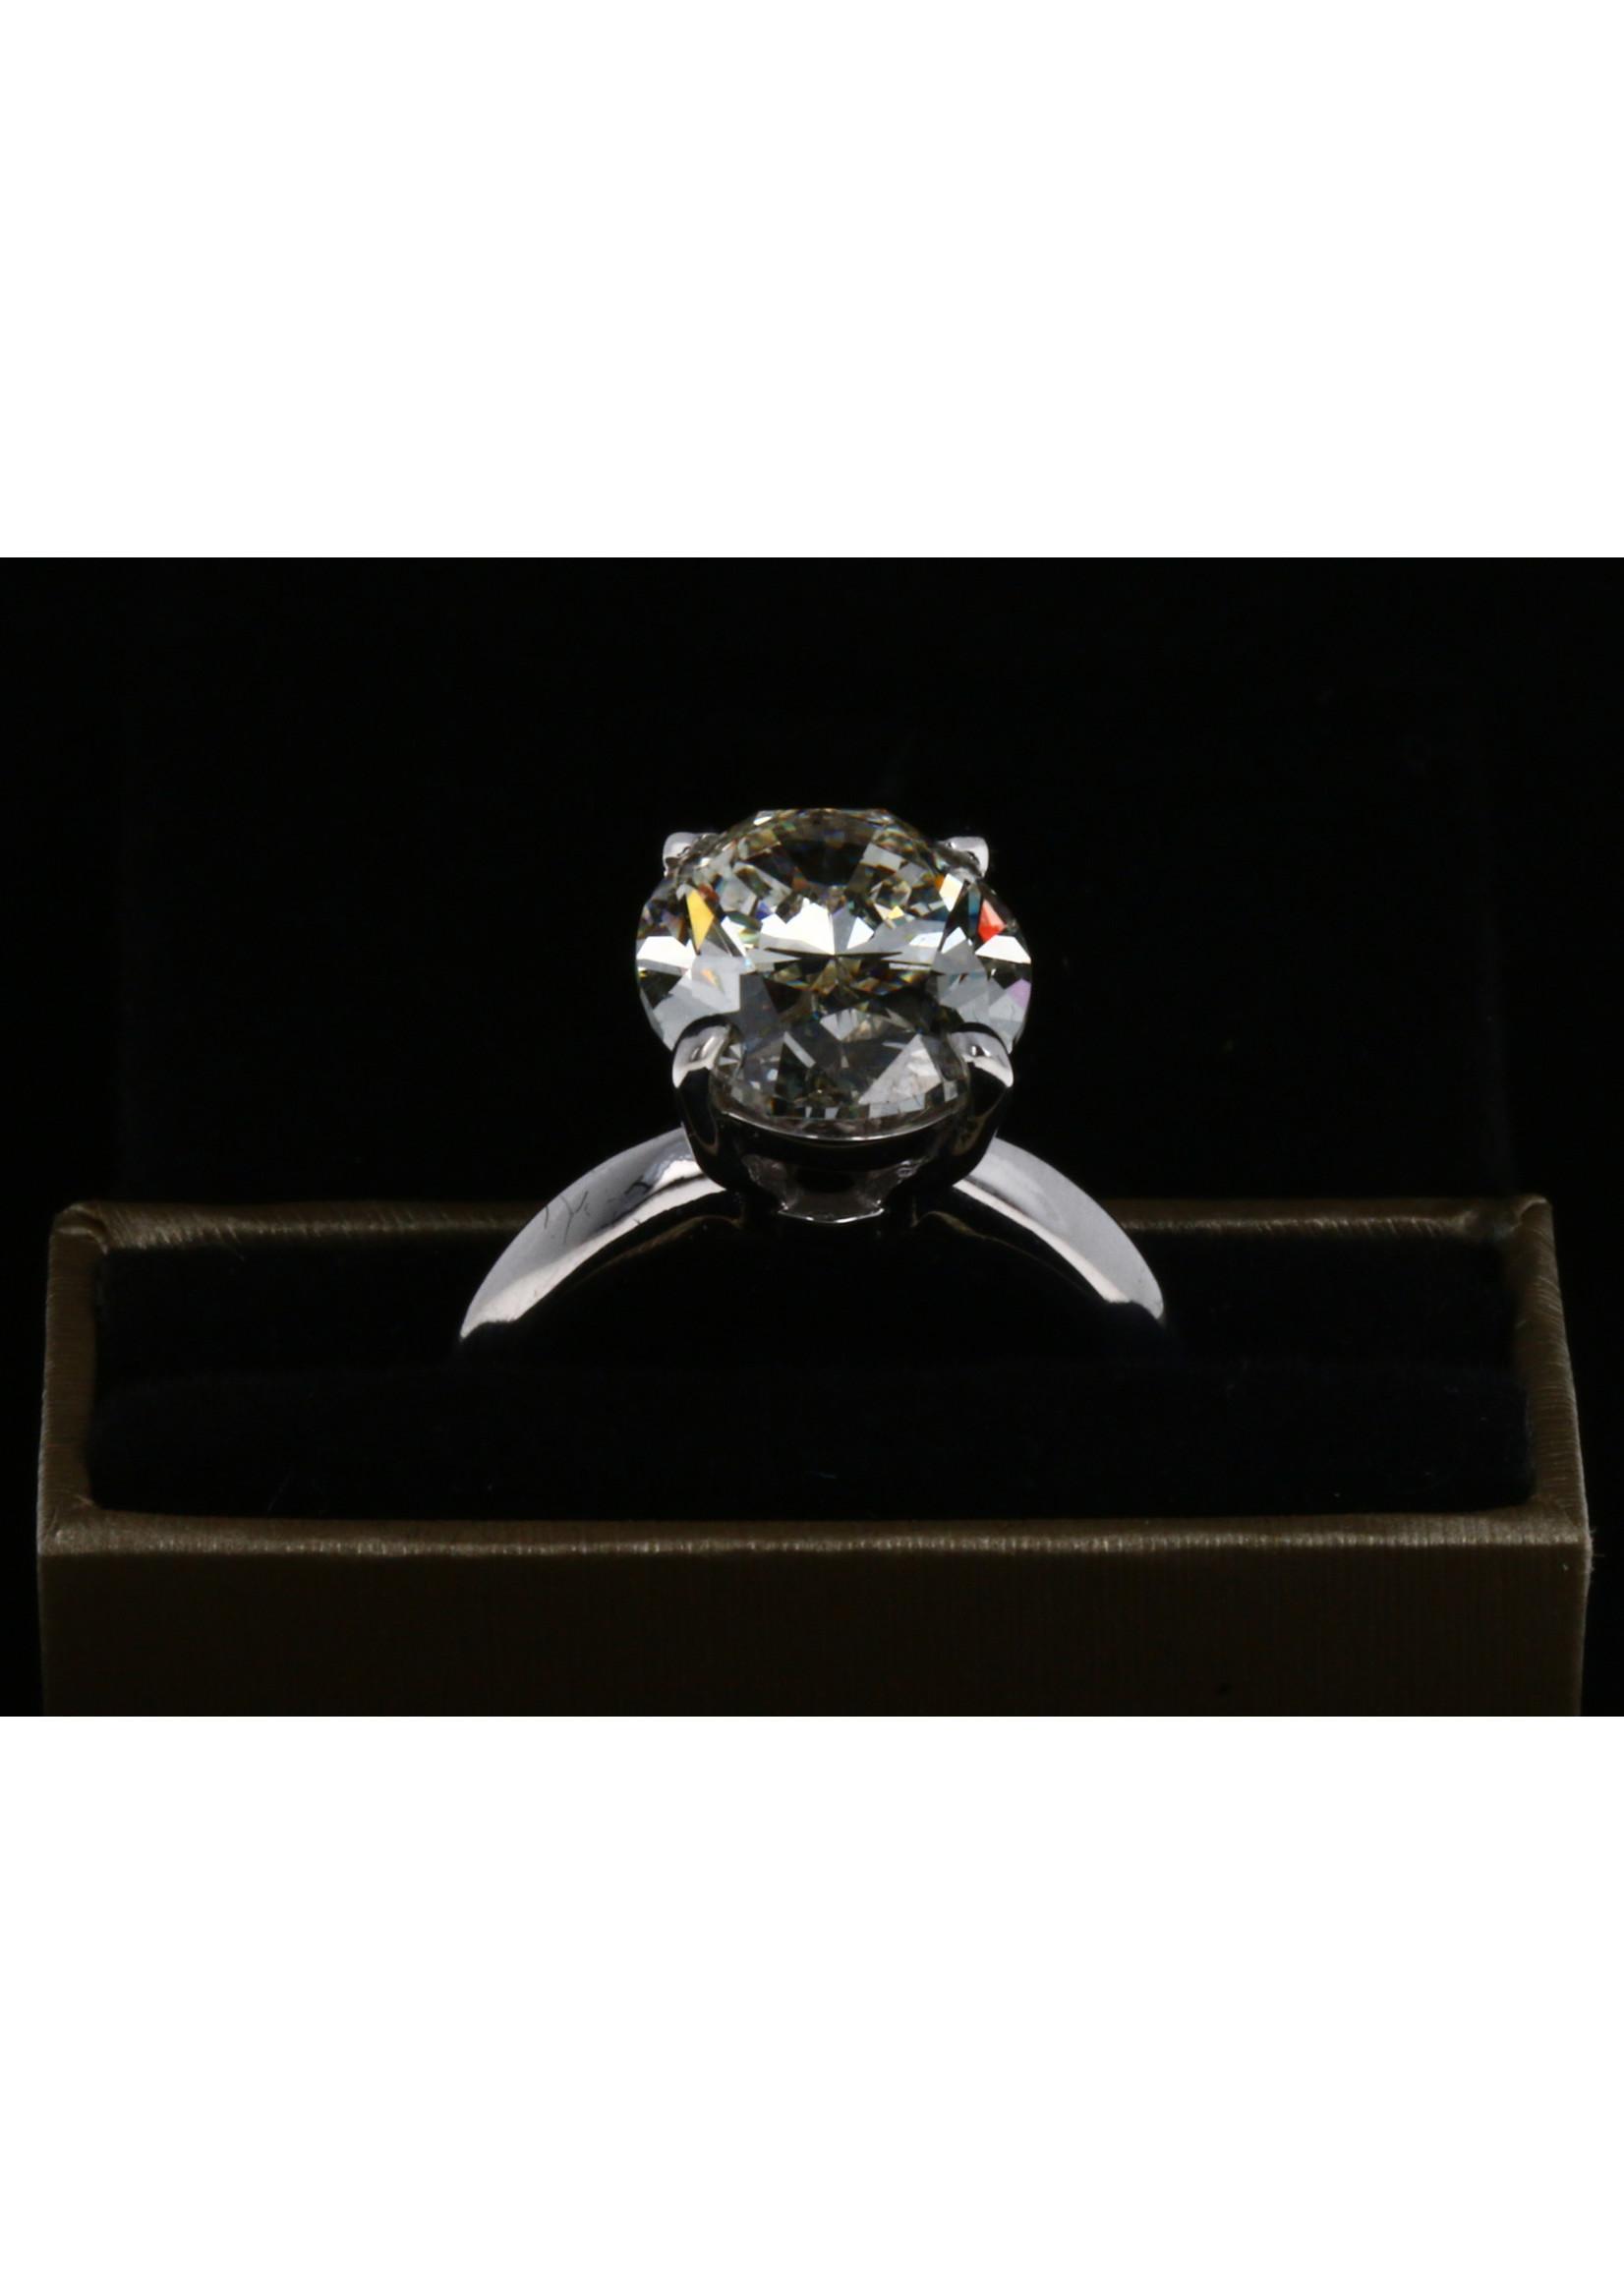 3.13 CT ROUND CUT DIAMOND RING VS2-E